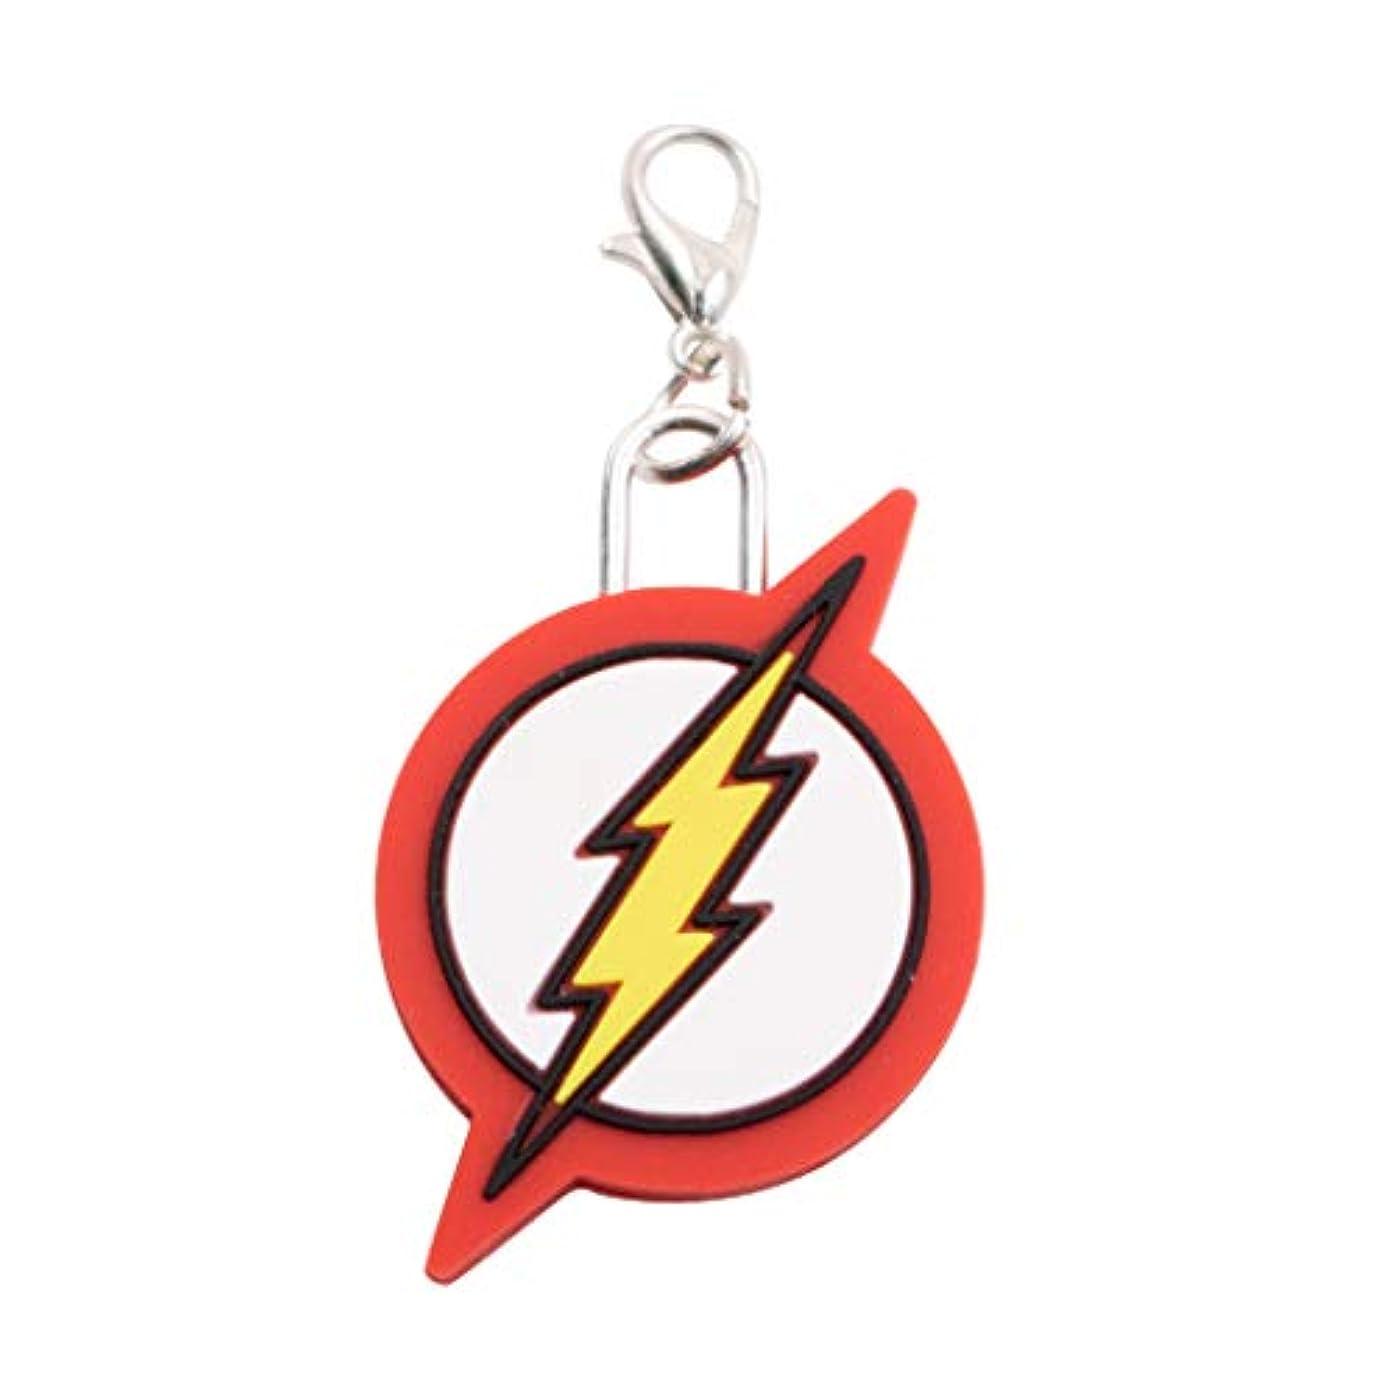 DC Comics The Flash Logo Key Chain Shaped PVC Zipper Pull